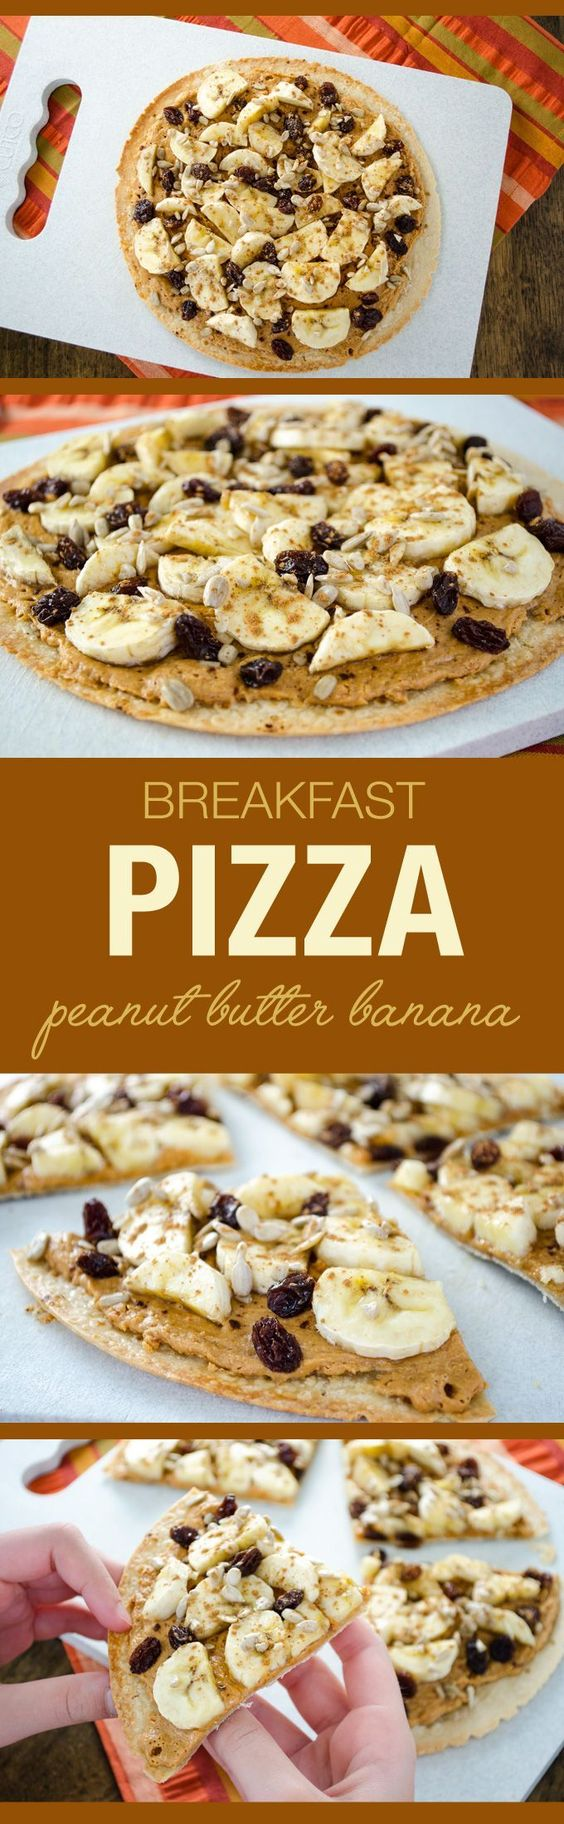 Peanut Butter Banana Breakfast Pizza - an easy, fun and delicious vegan and gluten free recipe | VeggiePrimer.com